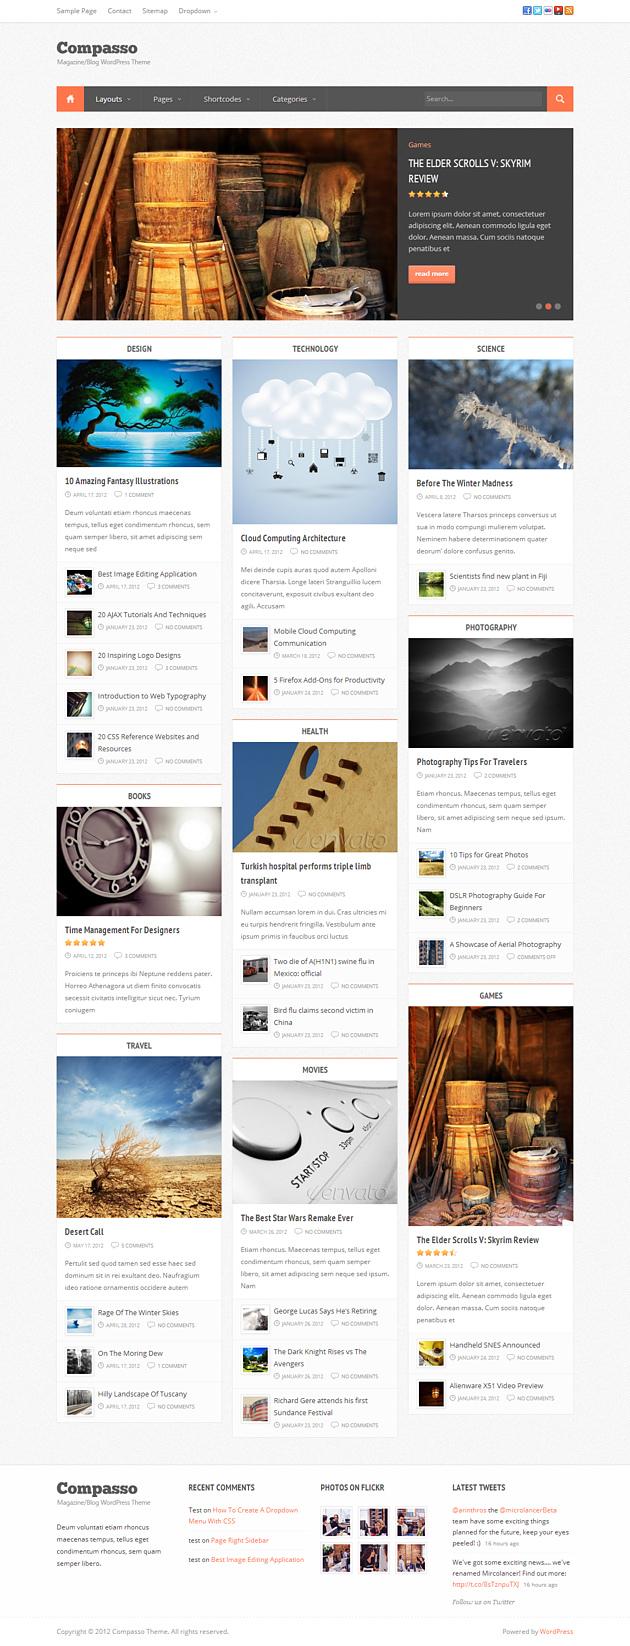 compasso pinterest style wordPress theme